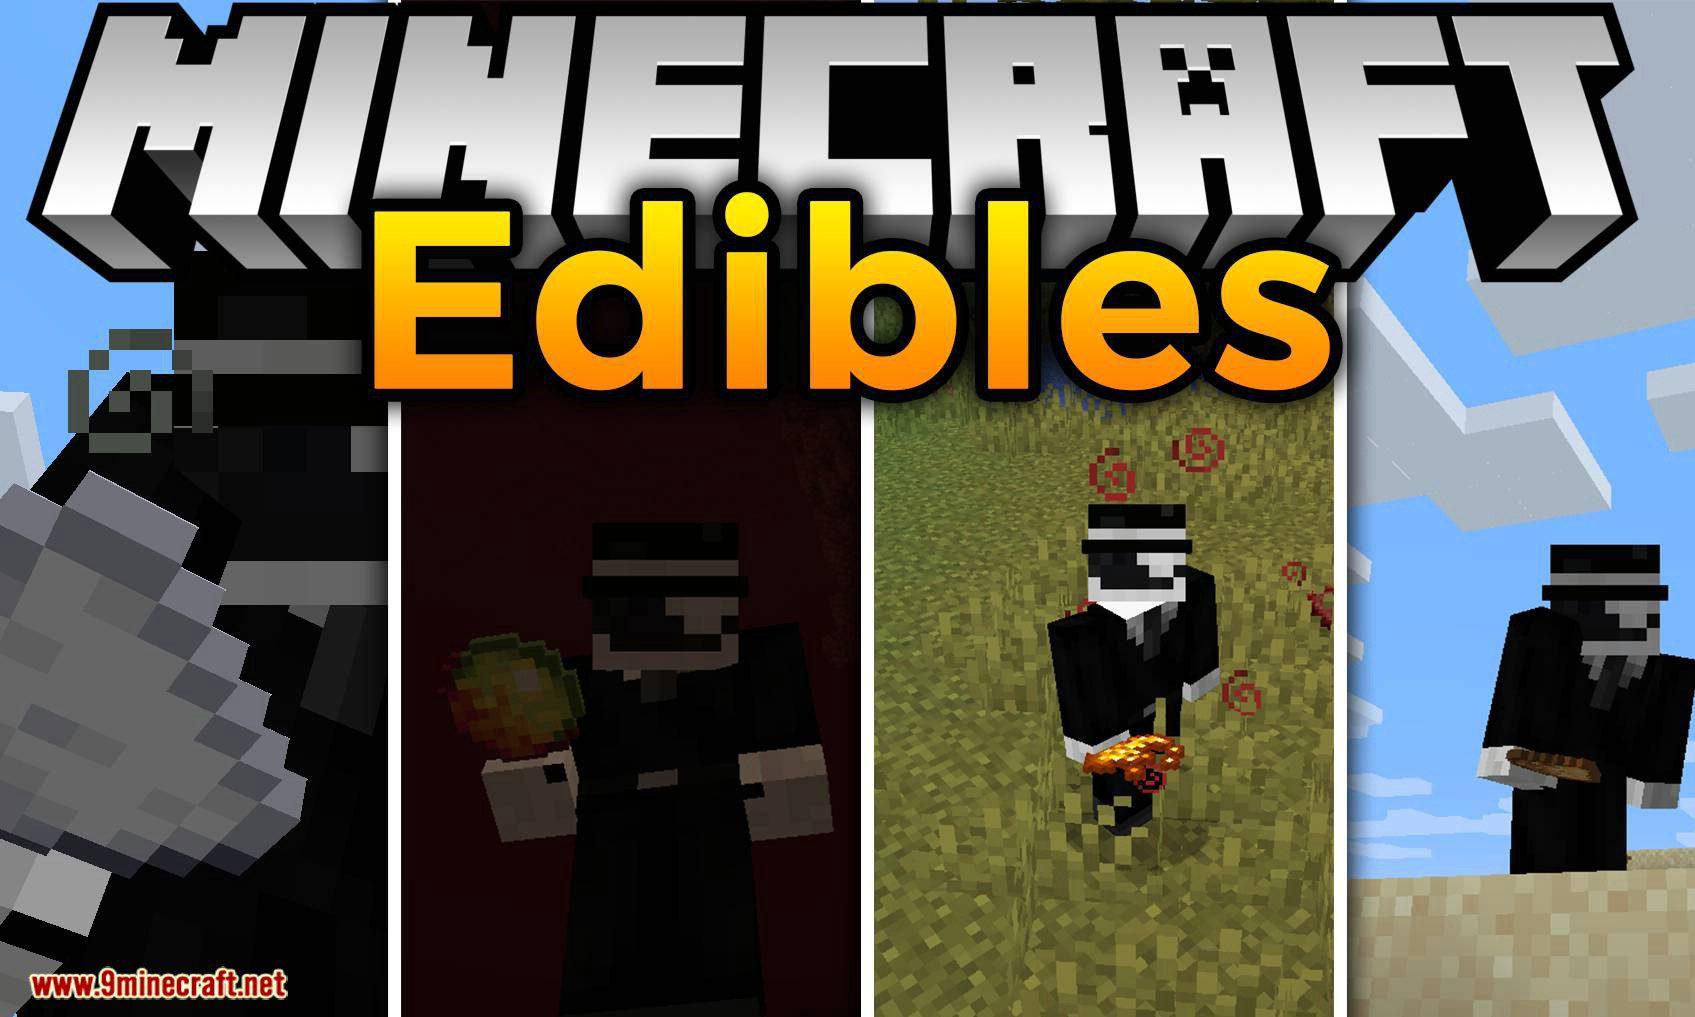 Edibles mod for minecraft logo